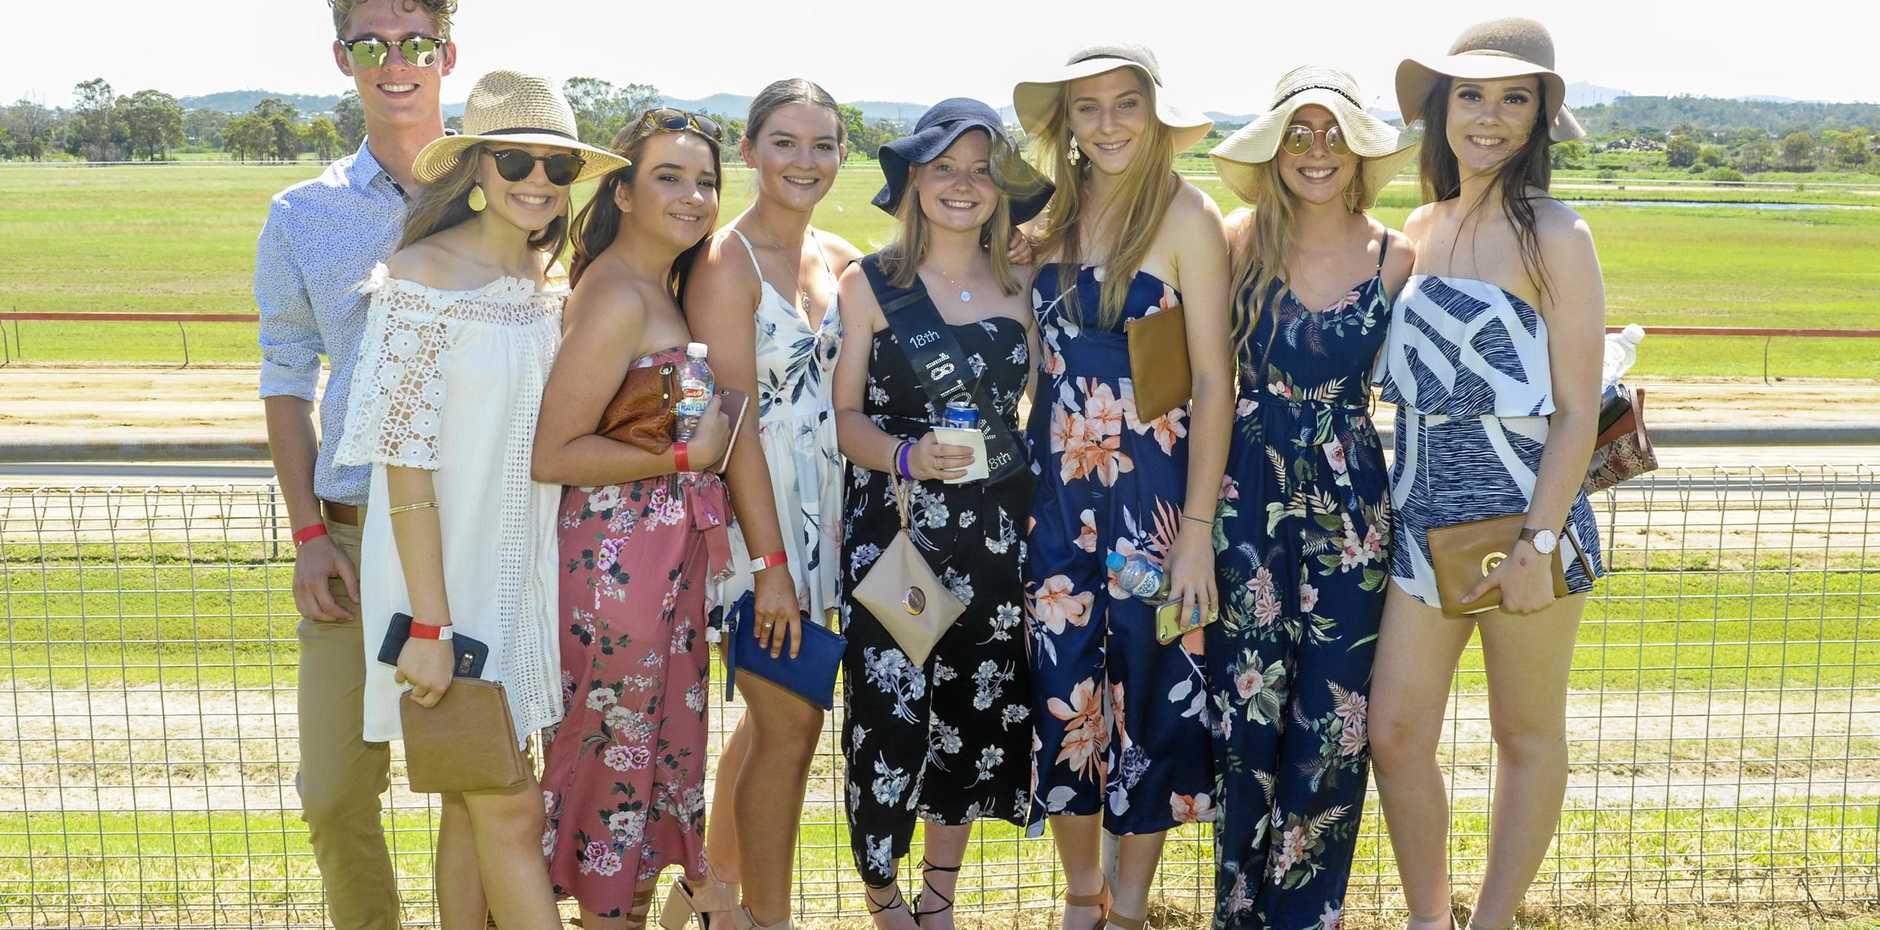 Lochie Carlson, Kaylah Gold, Taylor Pengelly, Katelyn Oliver, Katelyn Hume, Yasmin Ramsay, Mikaela Allen and Samantha Green